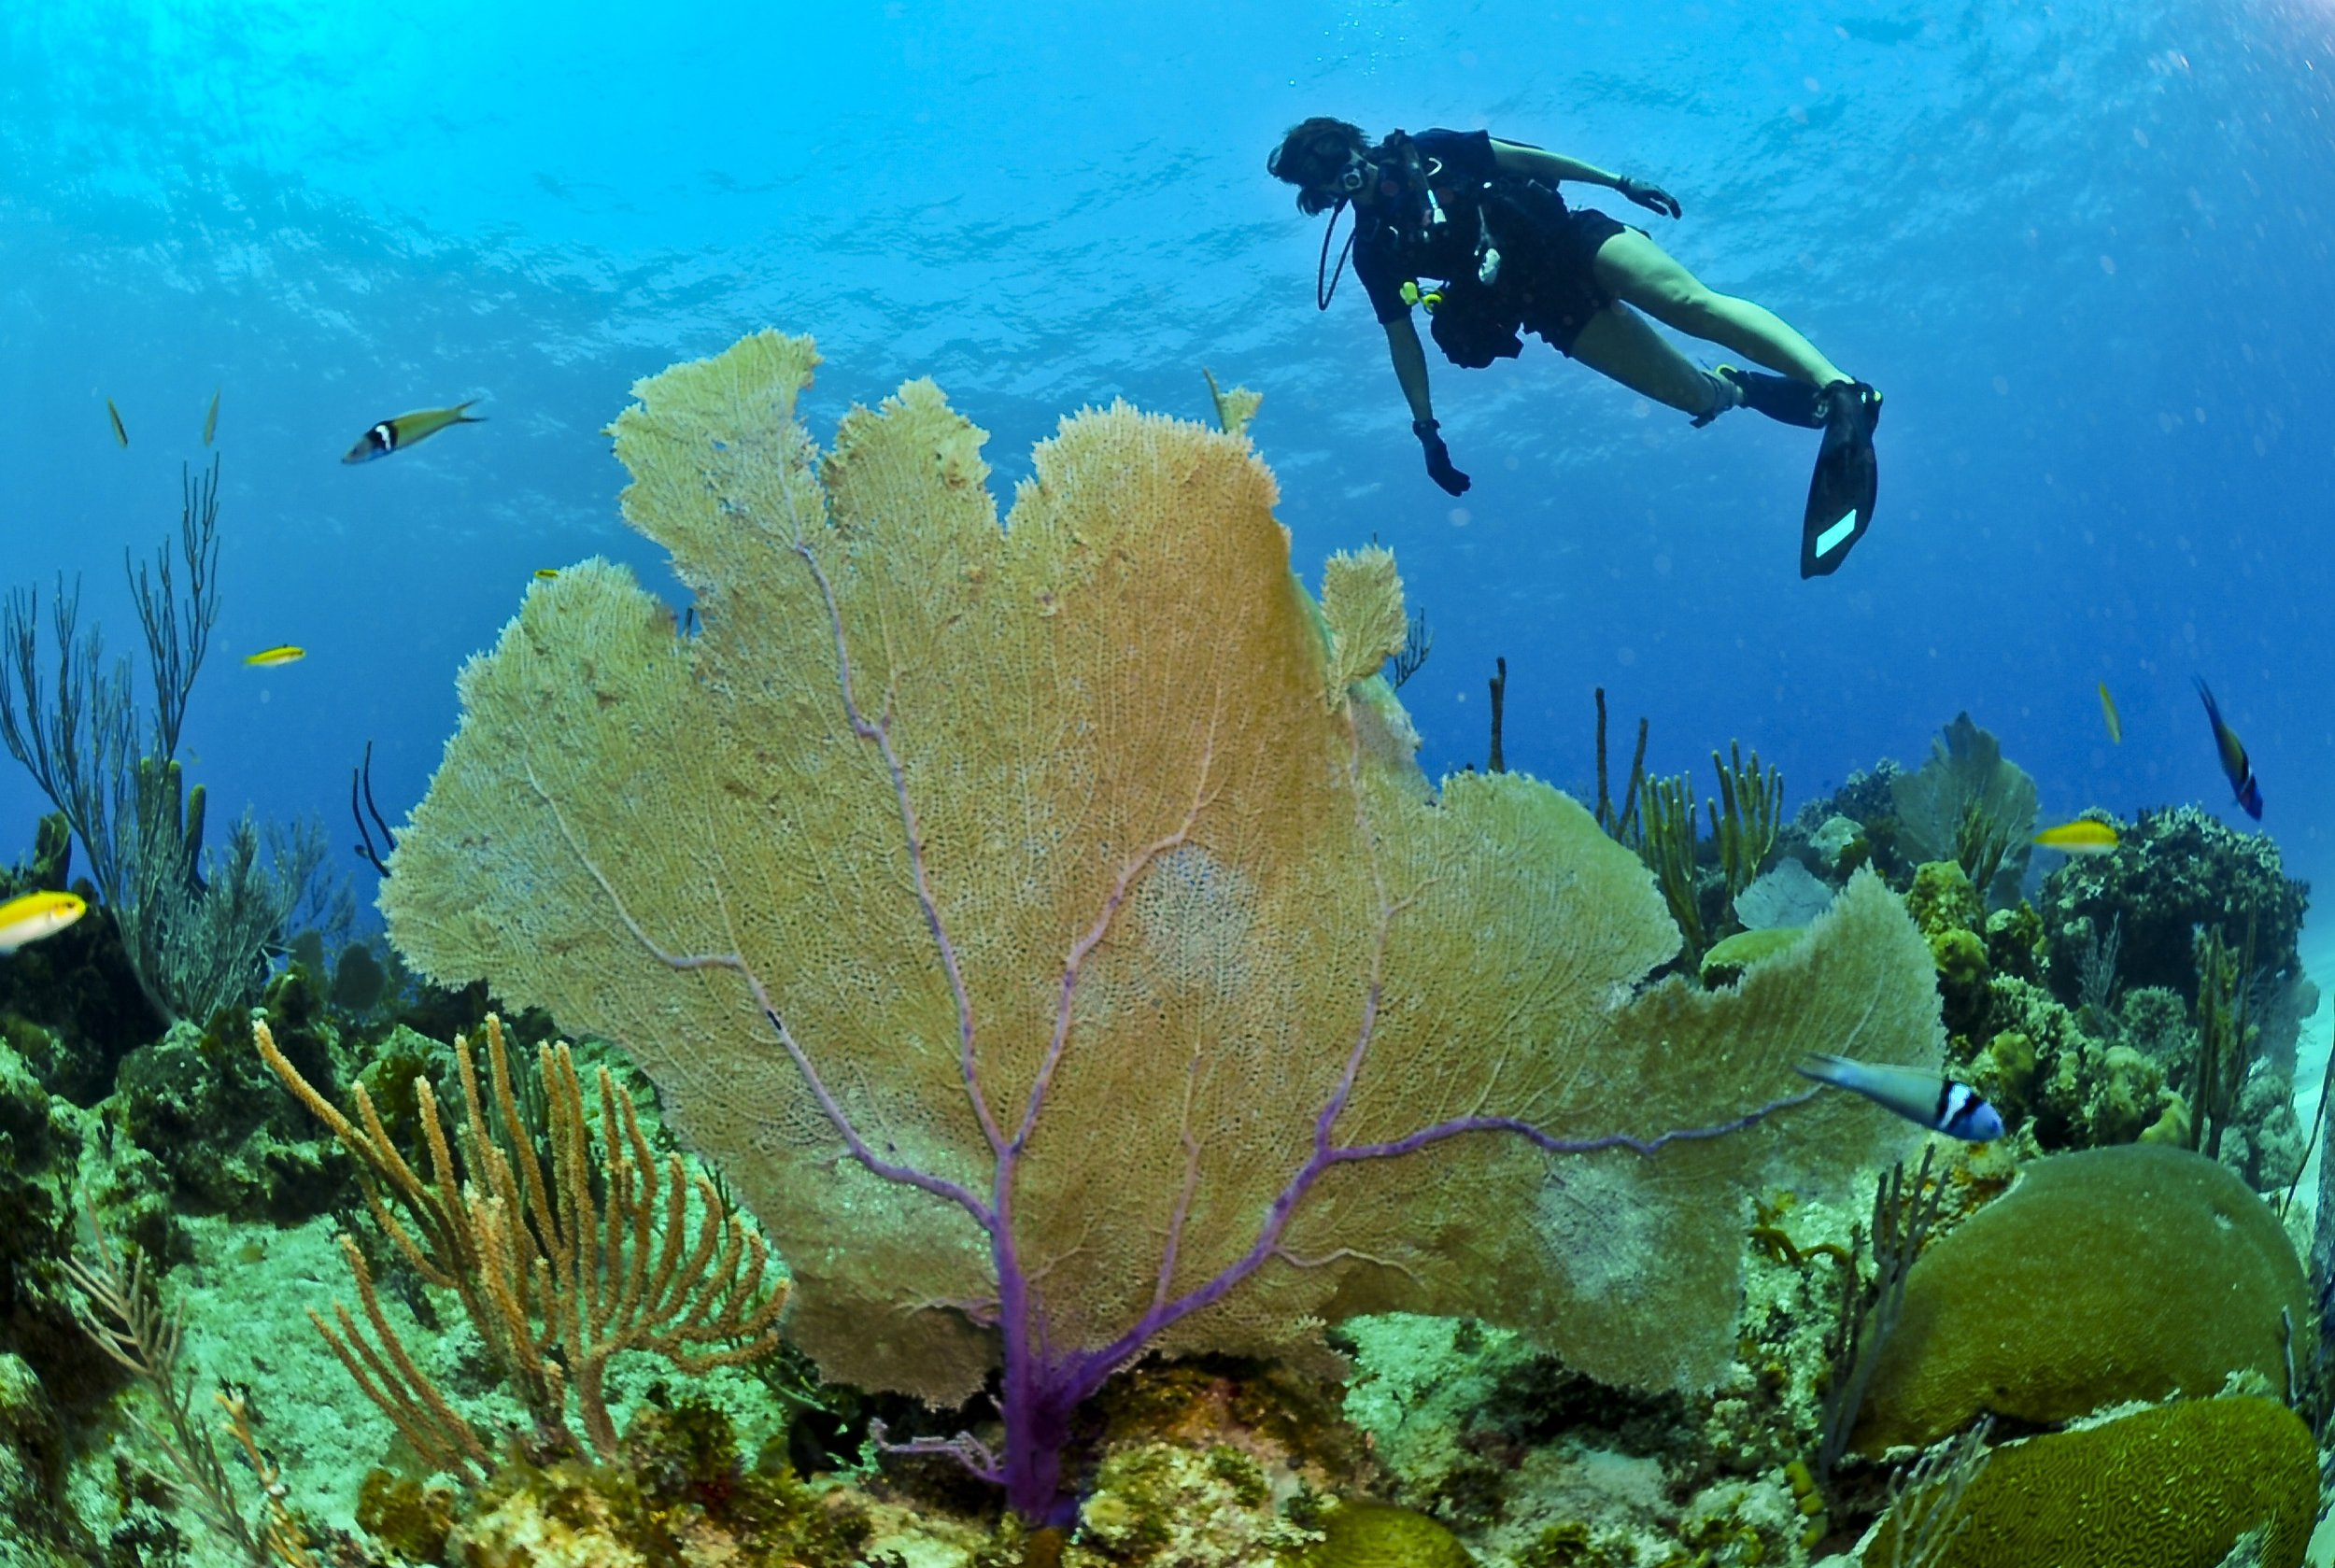 diver-huge-coral-underwater-pixabay.jpg